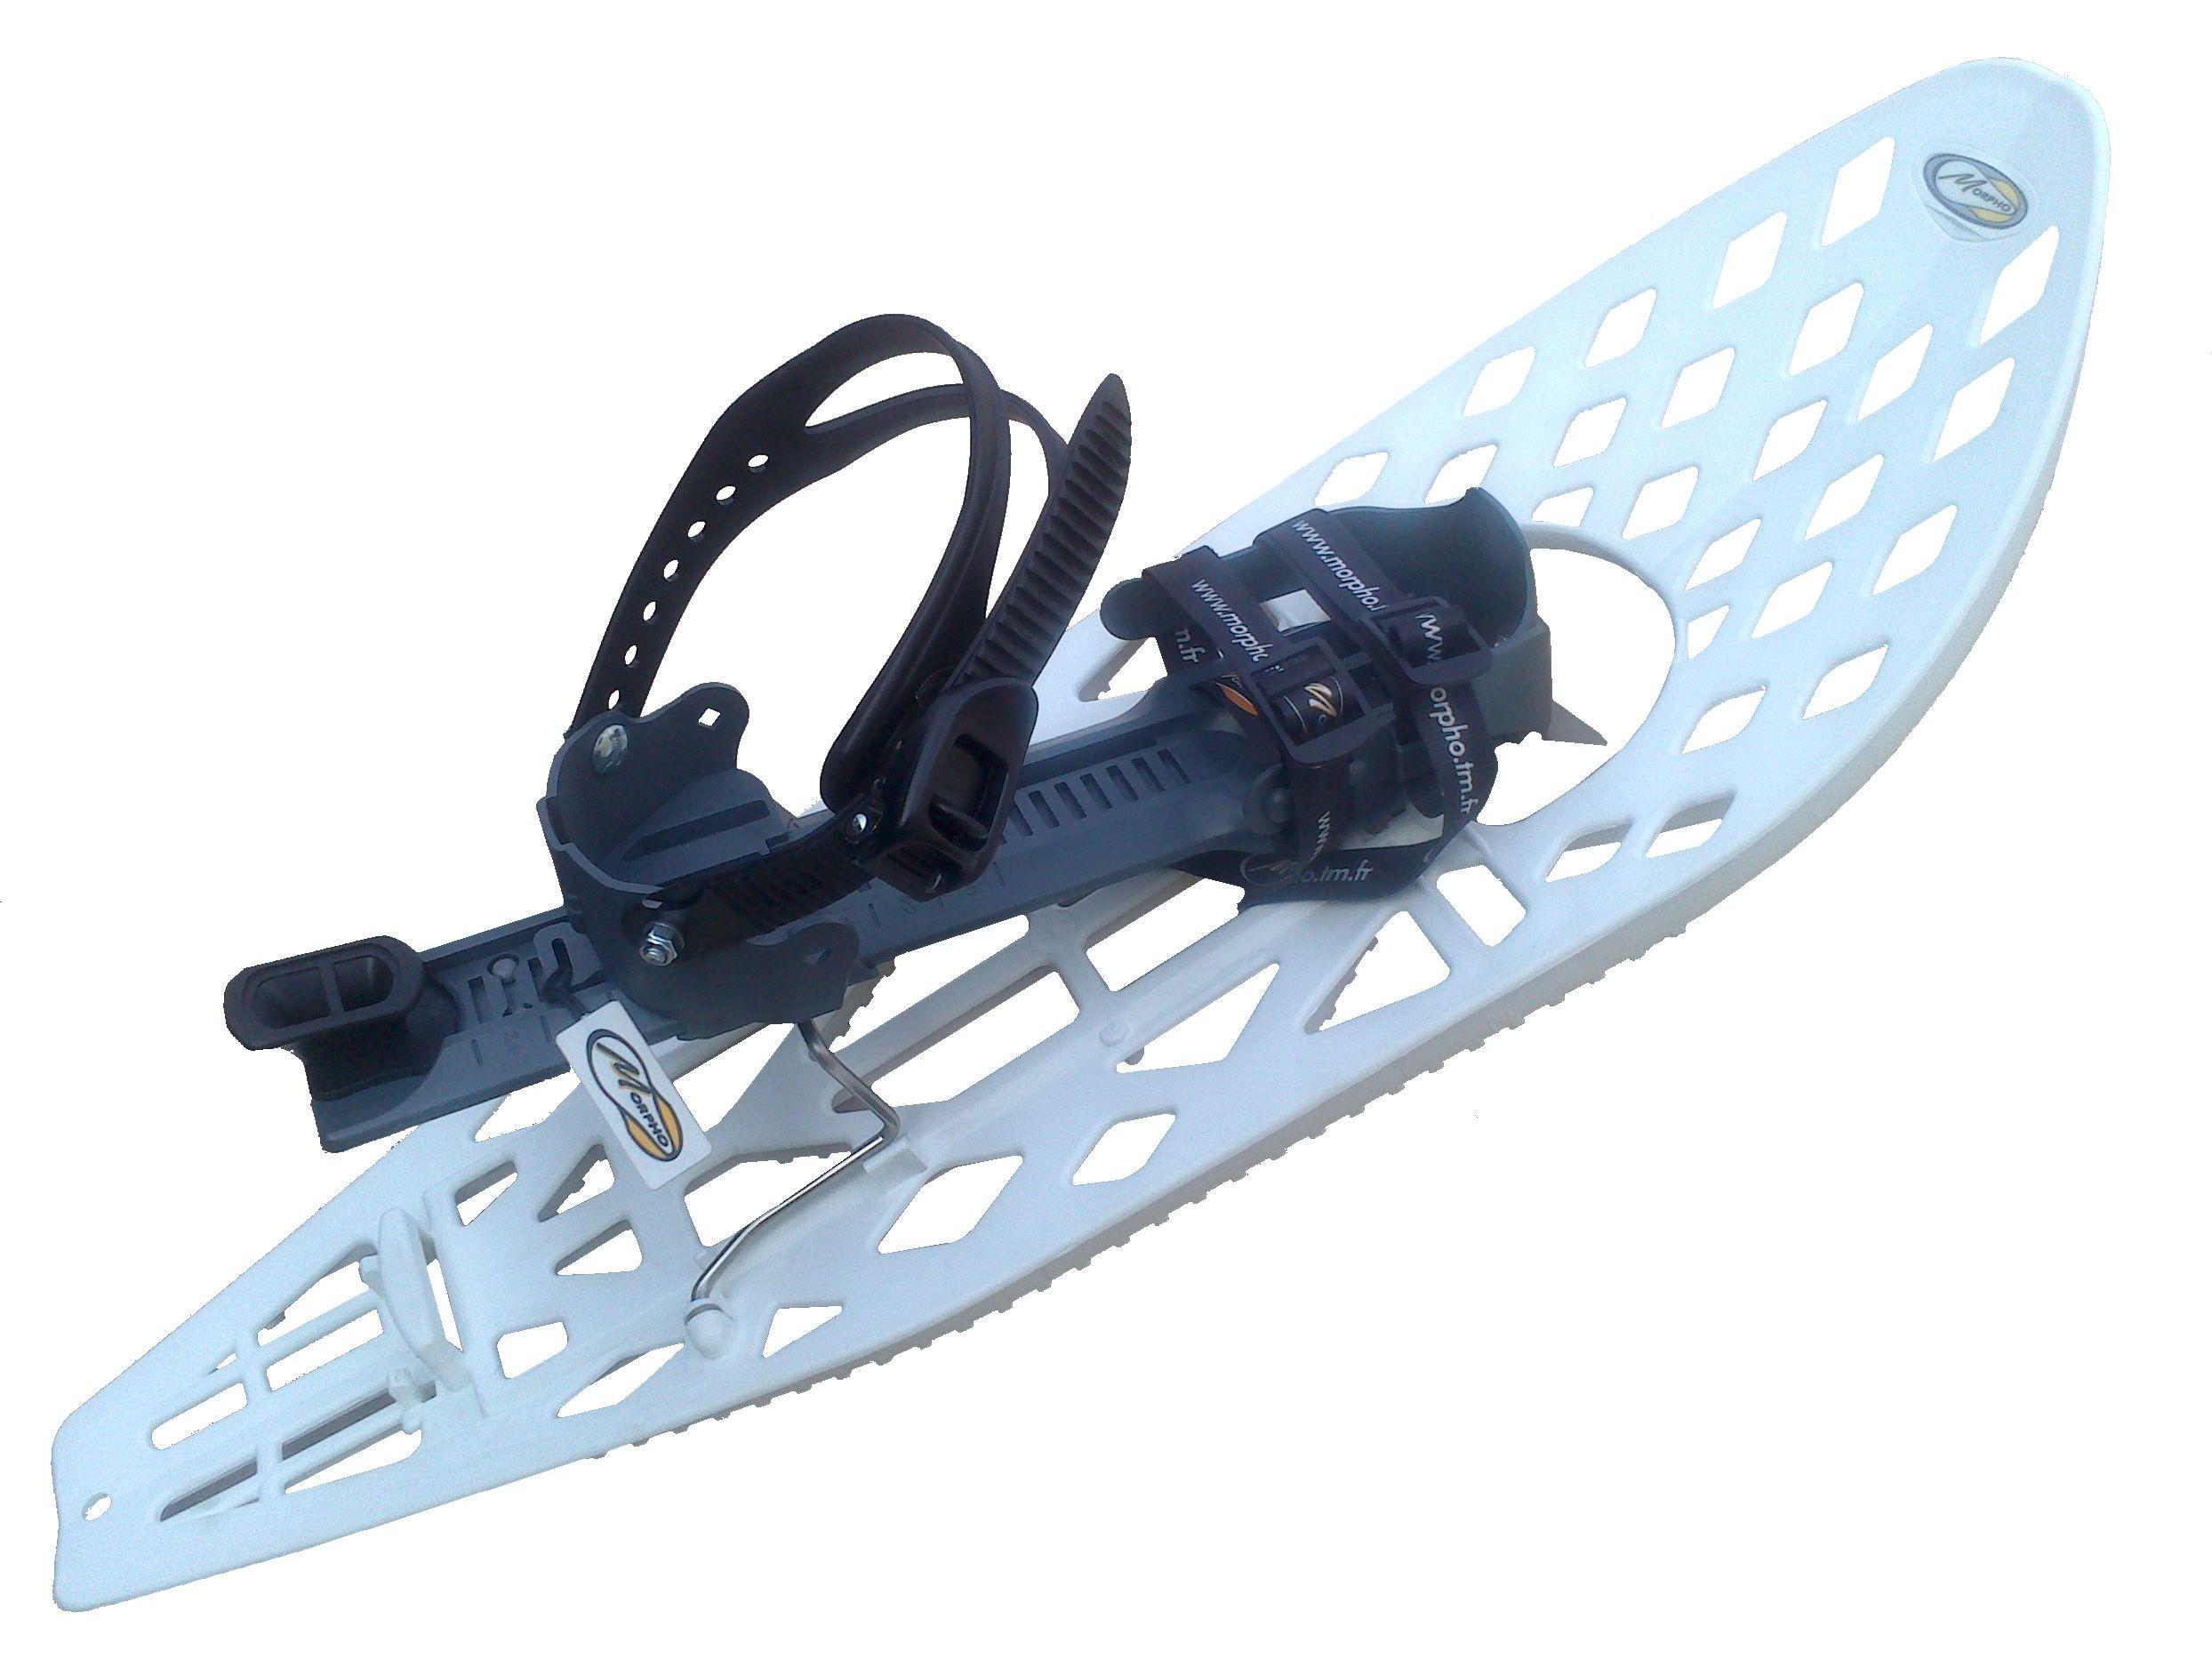 MORPHO Trimove Light Schneeschuhe mit Fußgelenk-Schnallen Snow Wandern Gr.M GB5